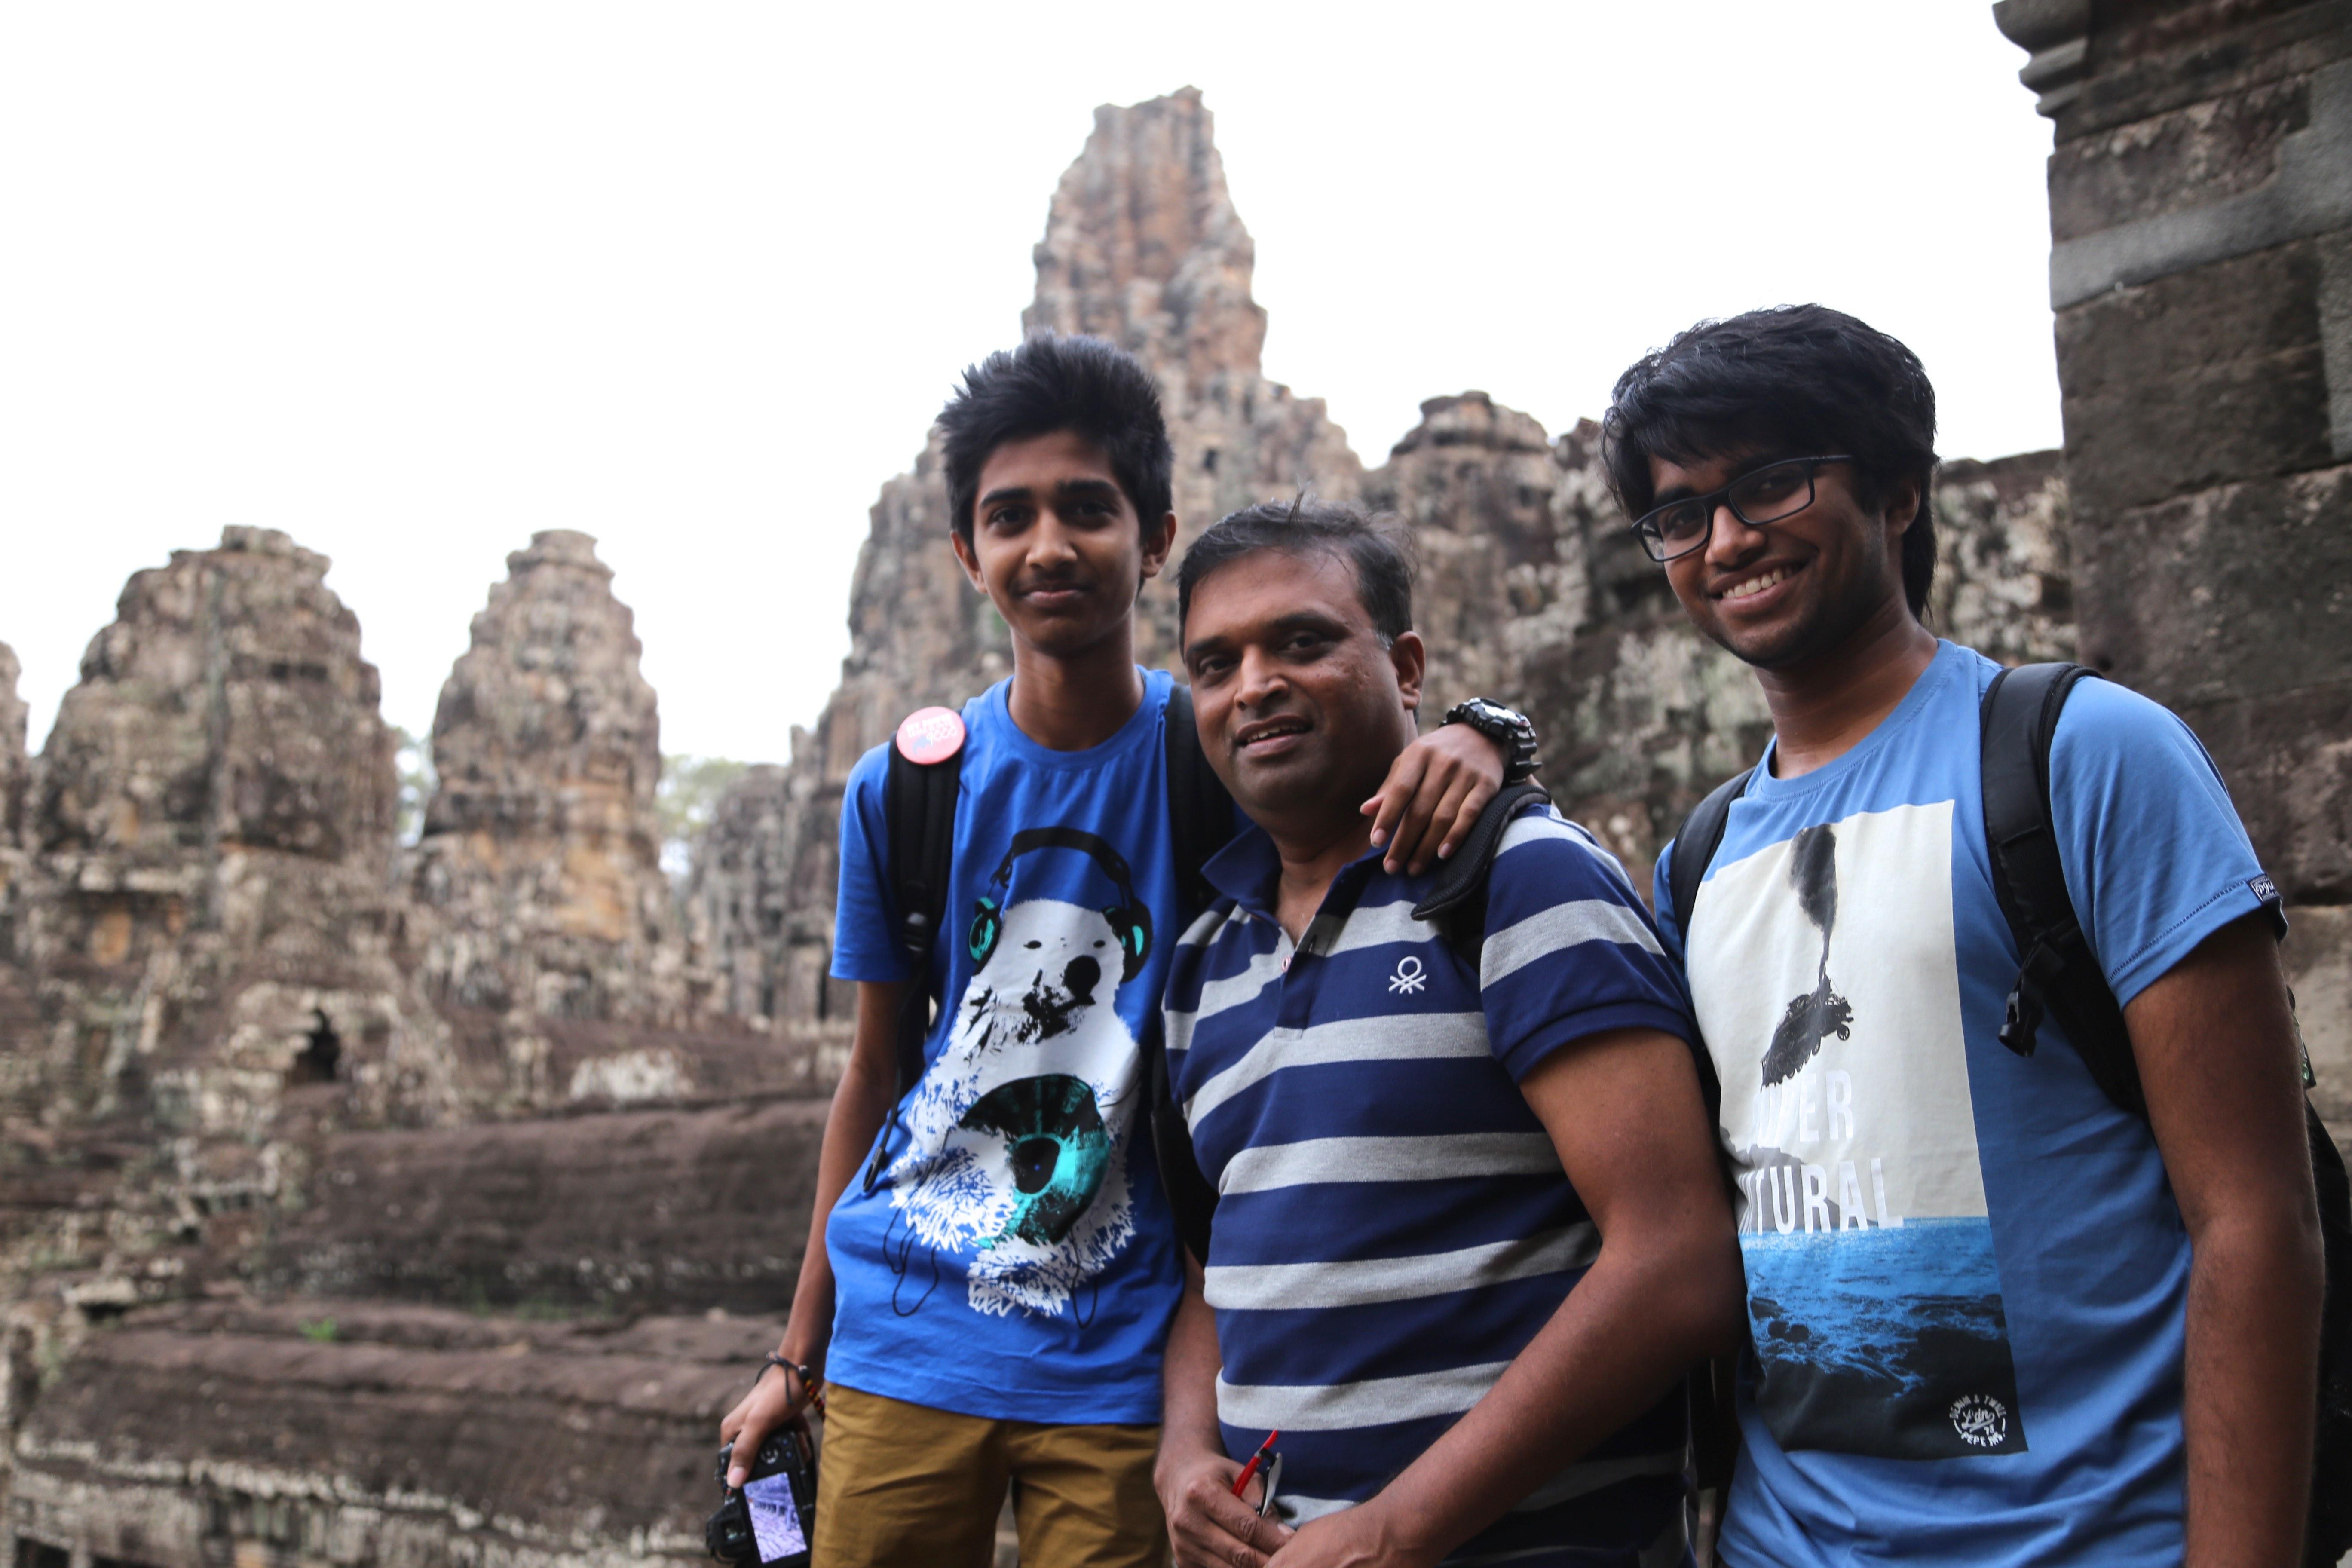 #BleedBlue @ Bayon Temple in Cambodia